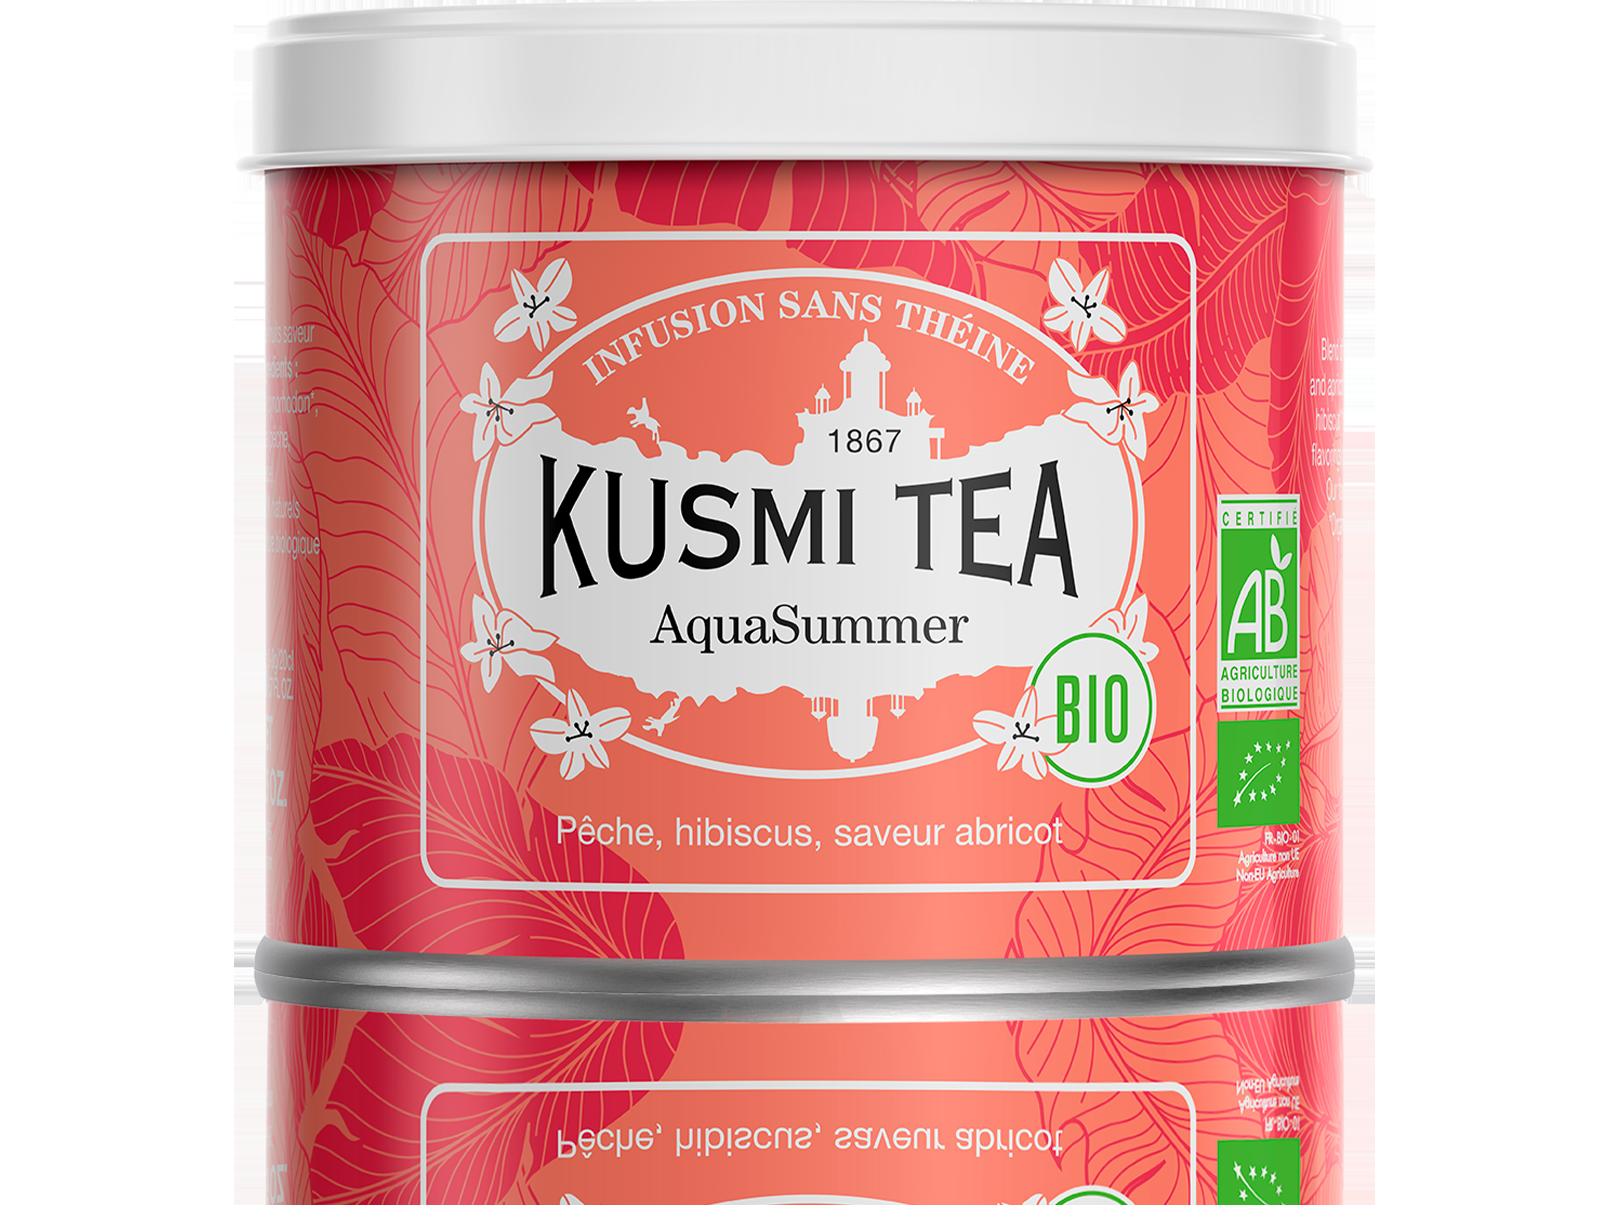 Infusion d'hibiscus bio - AquaSummer (Infusion de fruits bio) - Vrac - Kusmi Tea